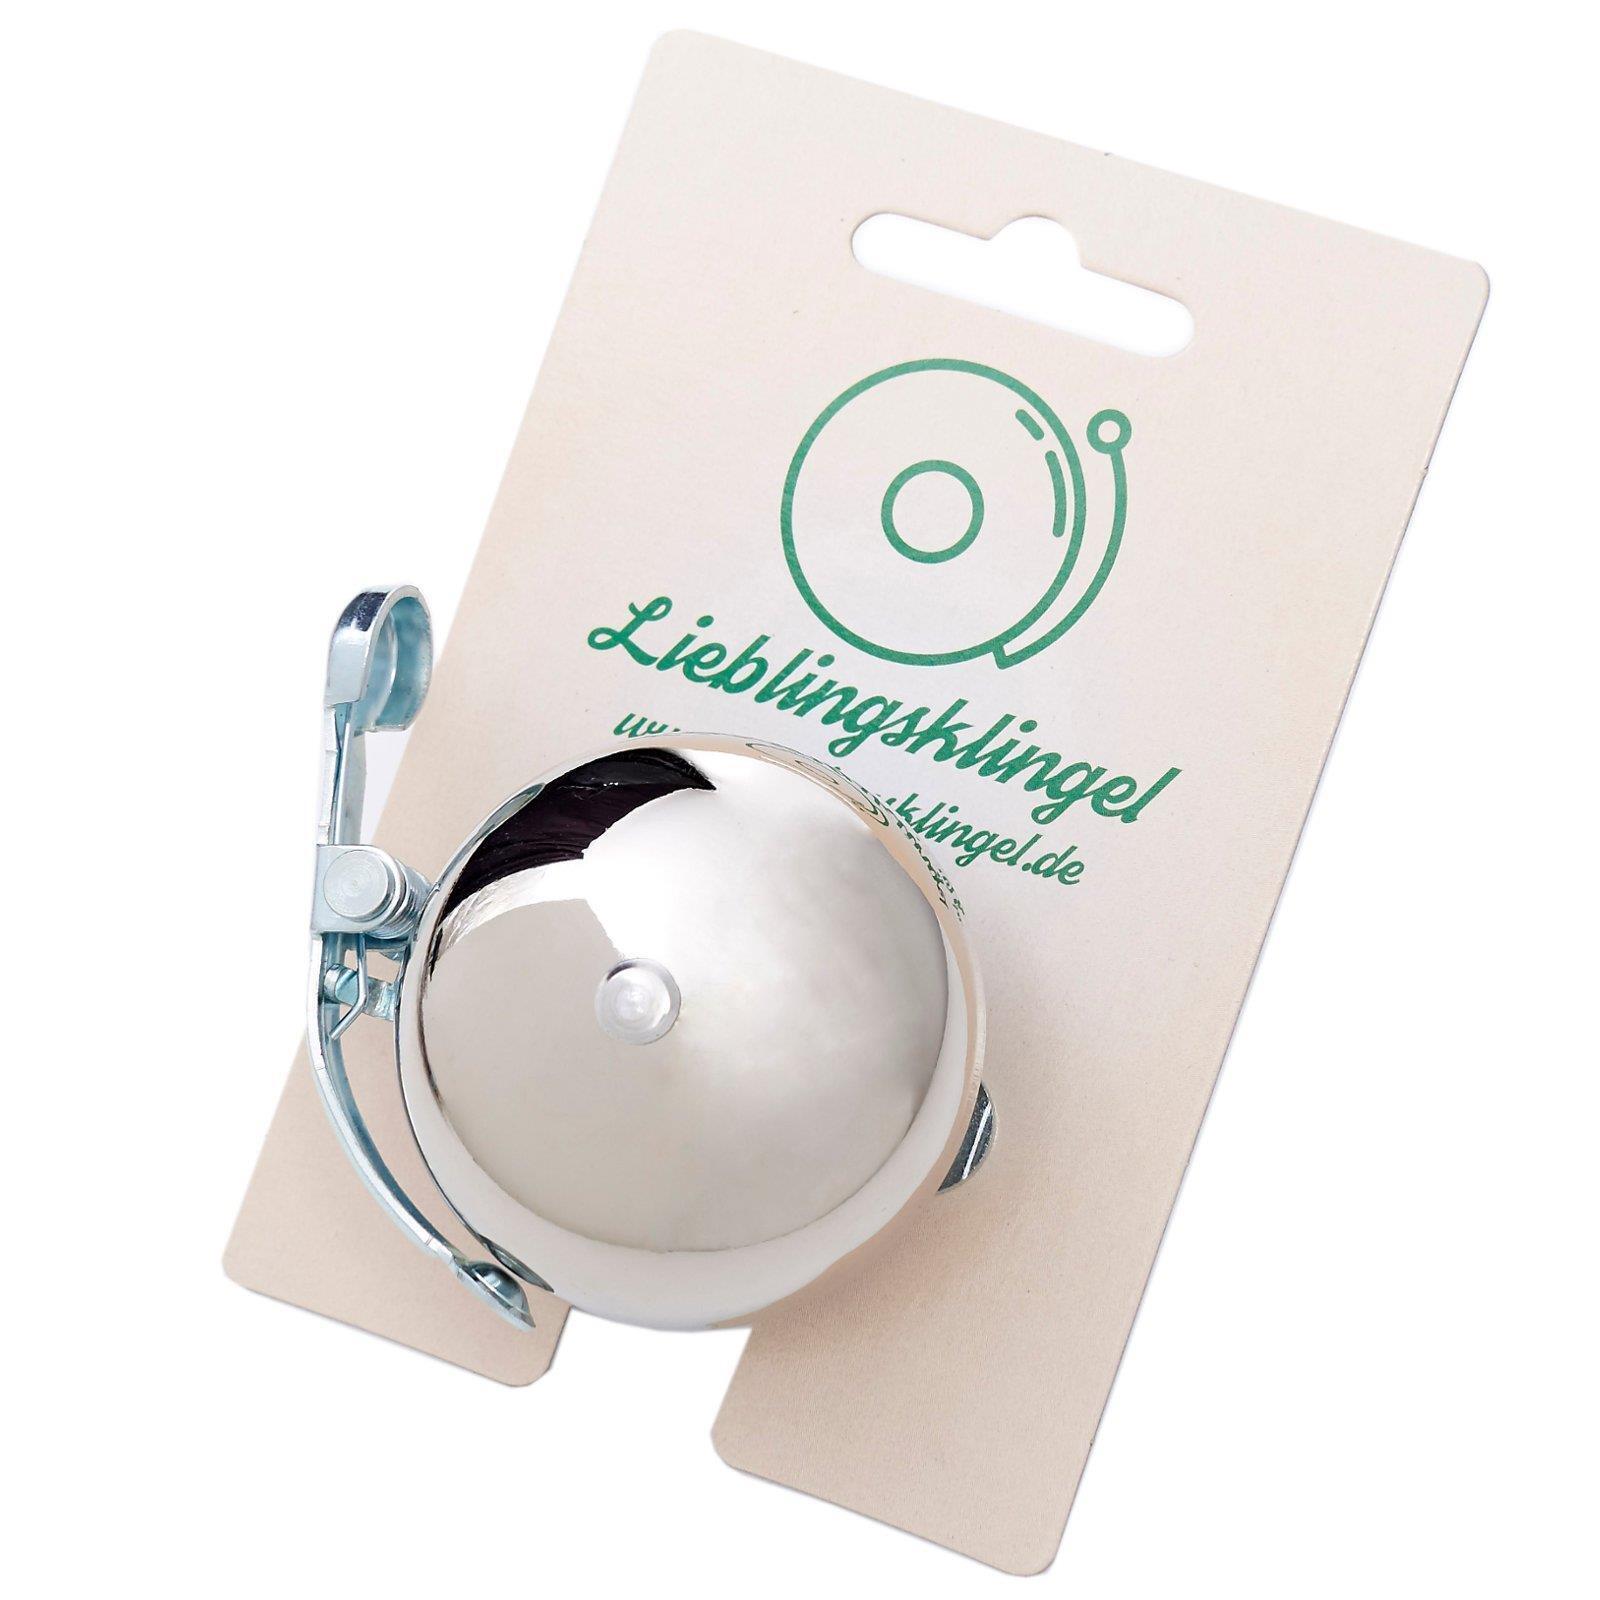 Lieblingsklingel Lieblingsklingel Lieblingsklingel mini bicicleta timbre Ø 50 mm campana Bell compacto parece cromado 6e0f30